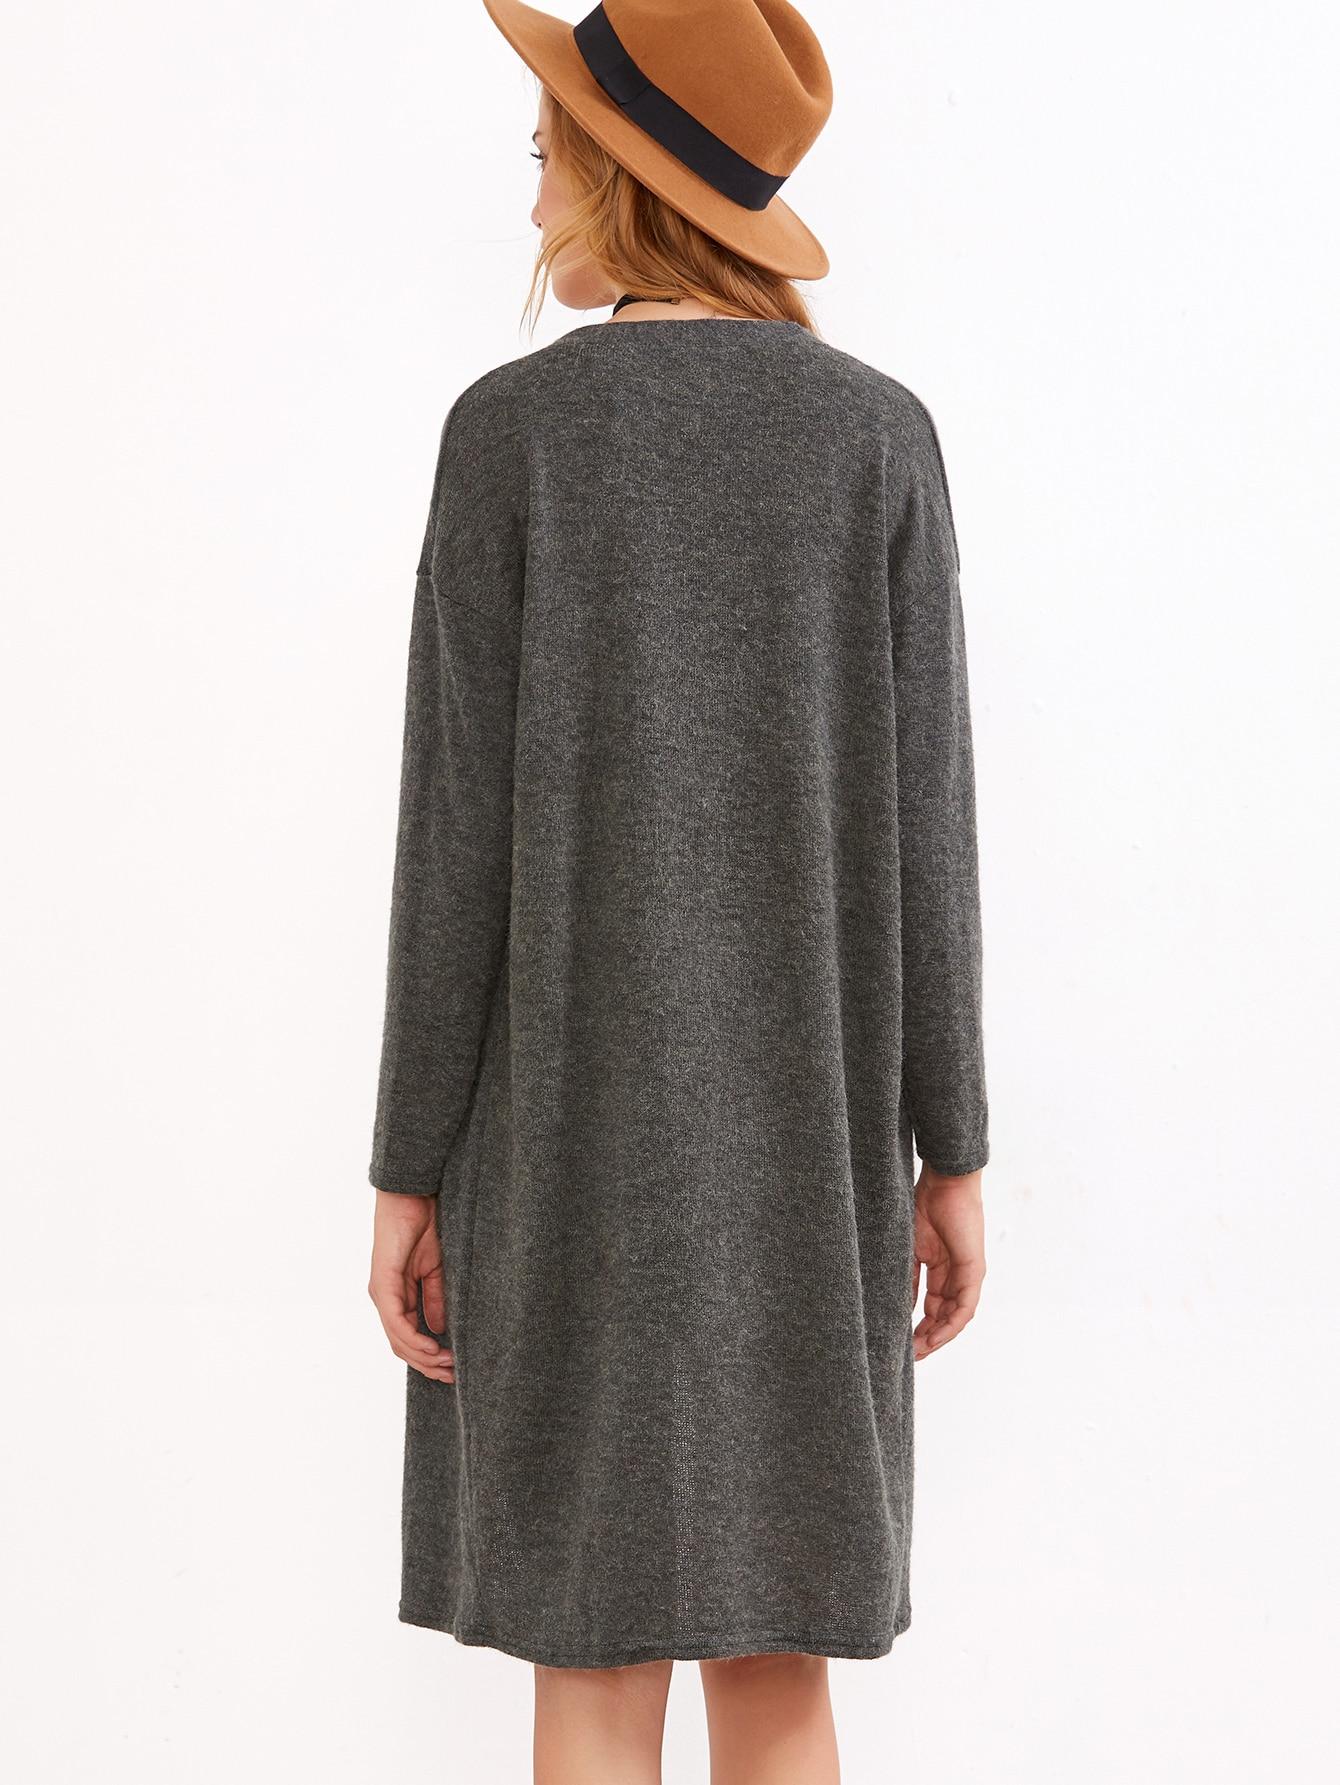 sweater161031101_2